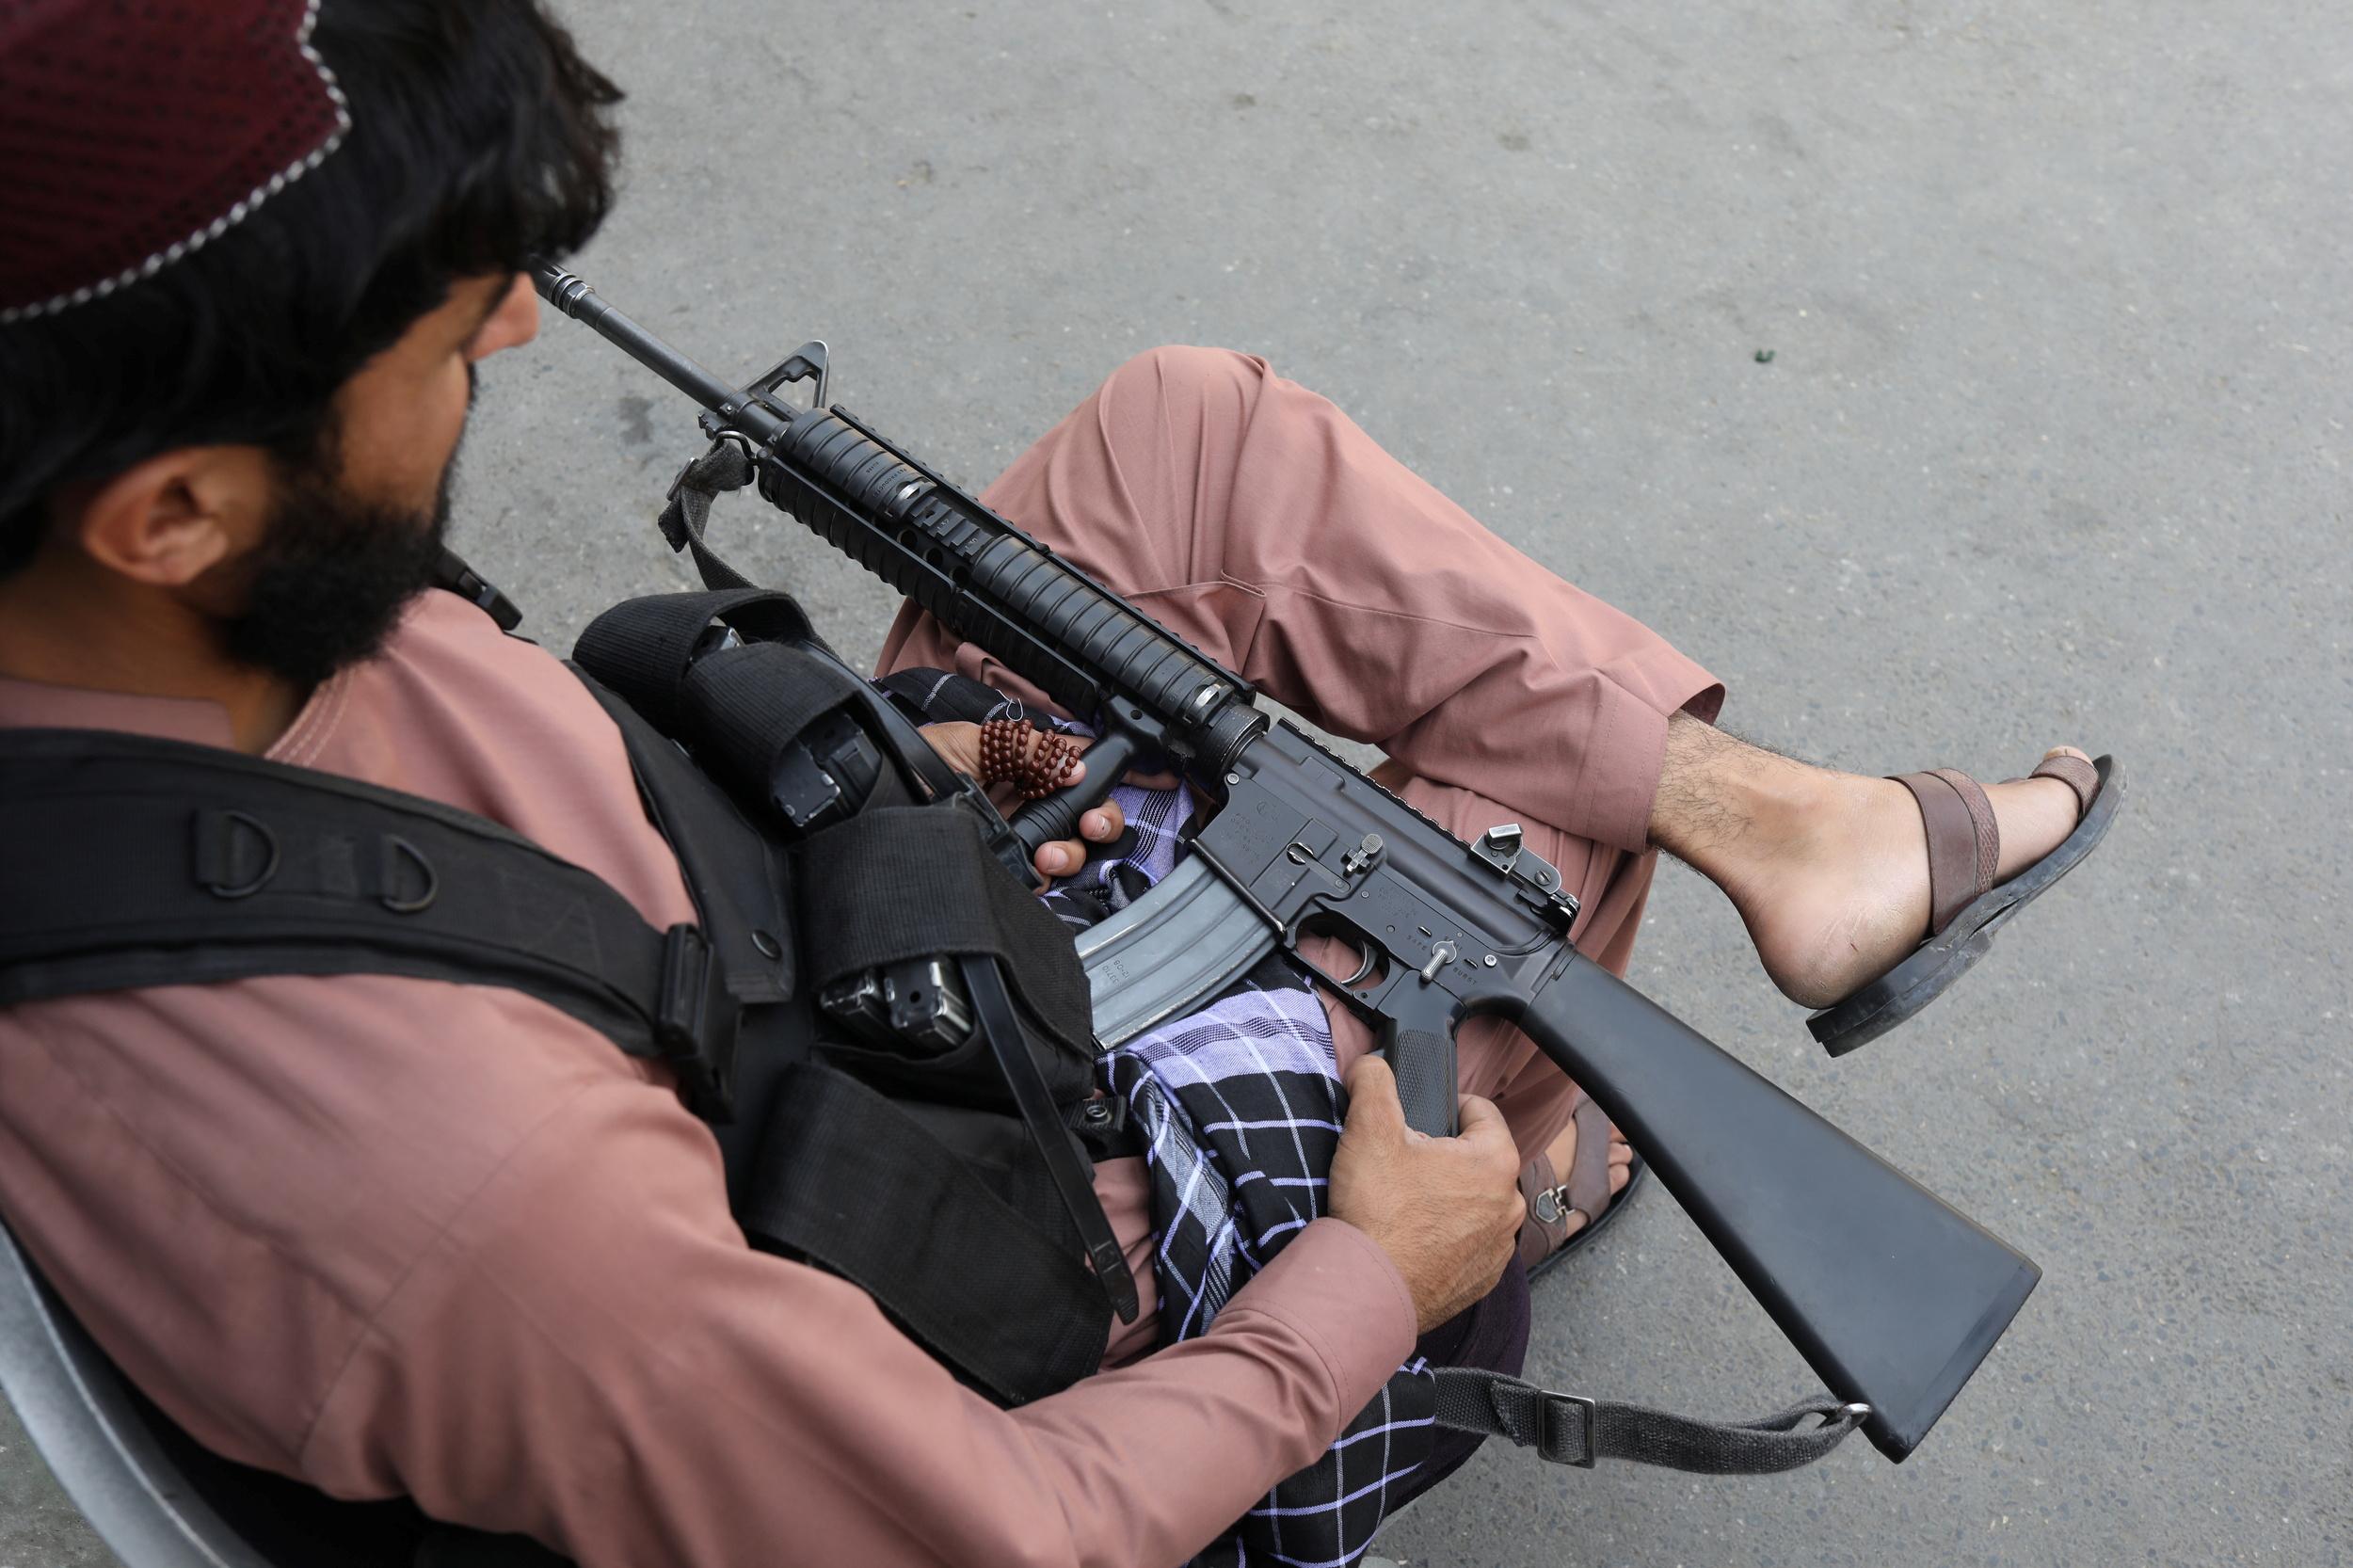 At least 17 killed in celebratory gunfire in Kabul - reports